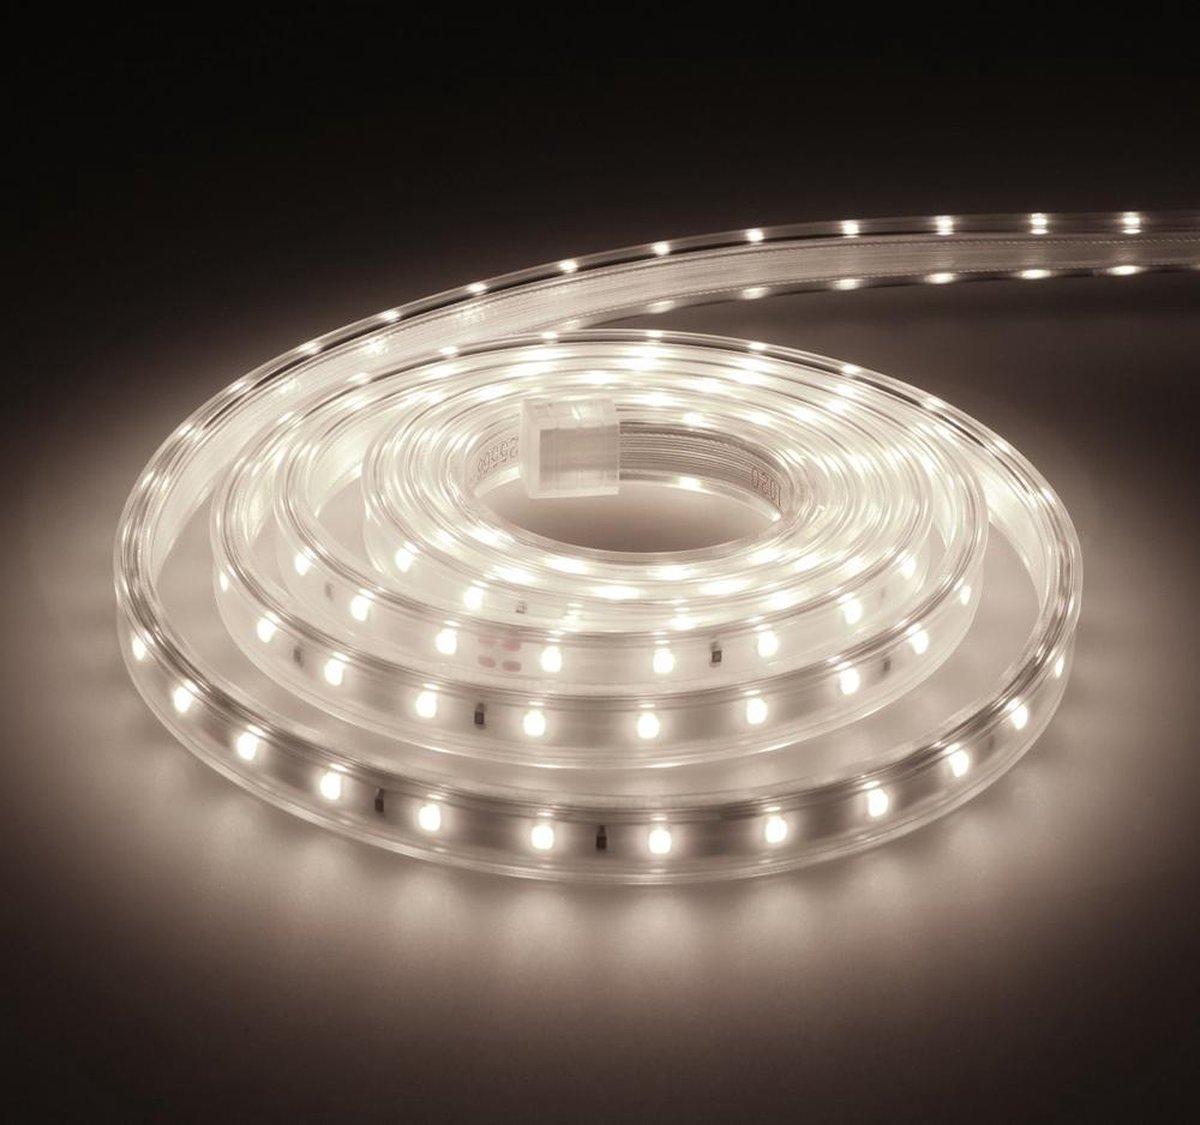 Dimbare LED Strip 2m 6000K 60 LEDs/m IP65 Plug & Play - Flex60 Series